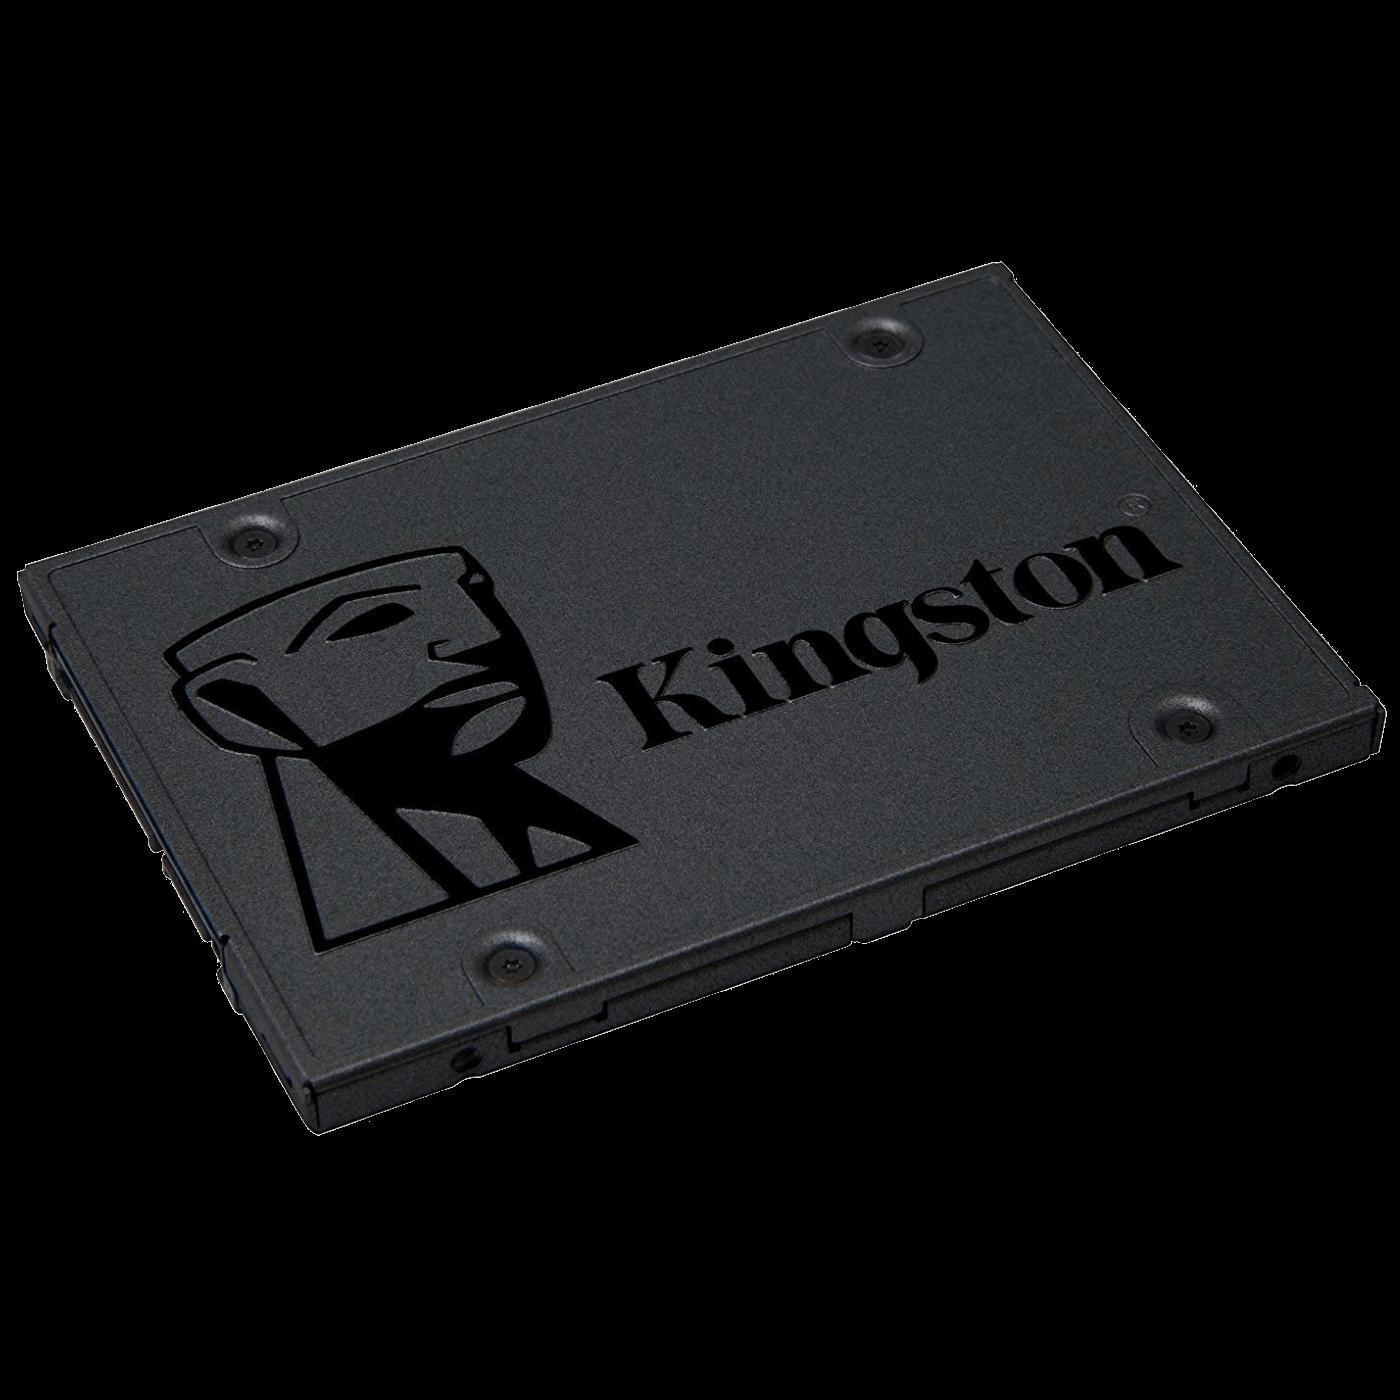 Kingston - SA400S37/240G